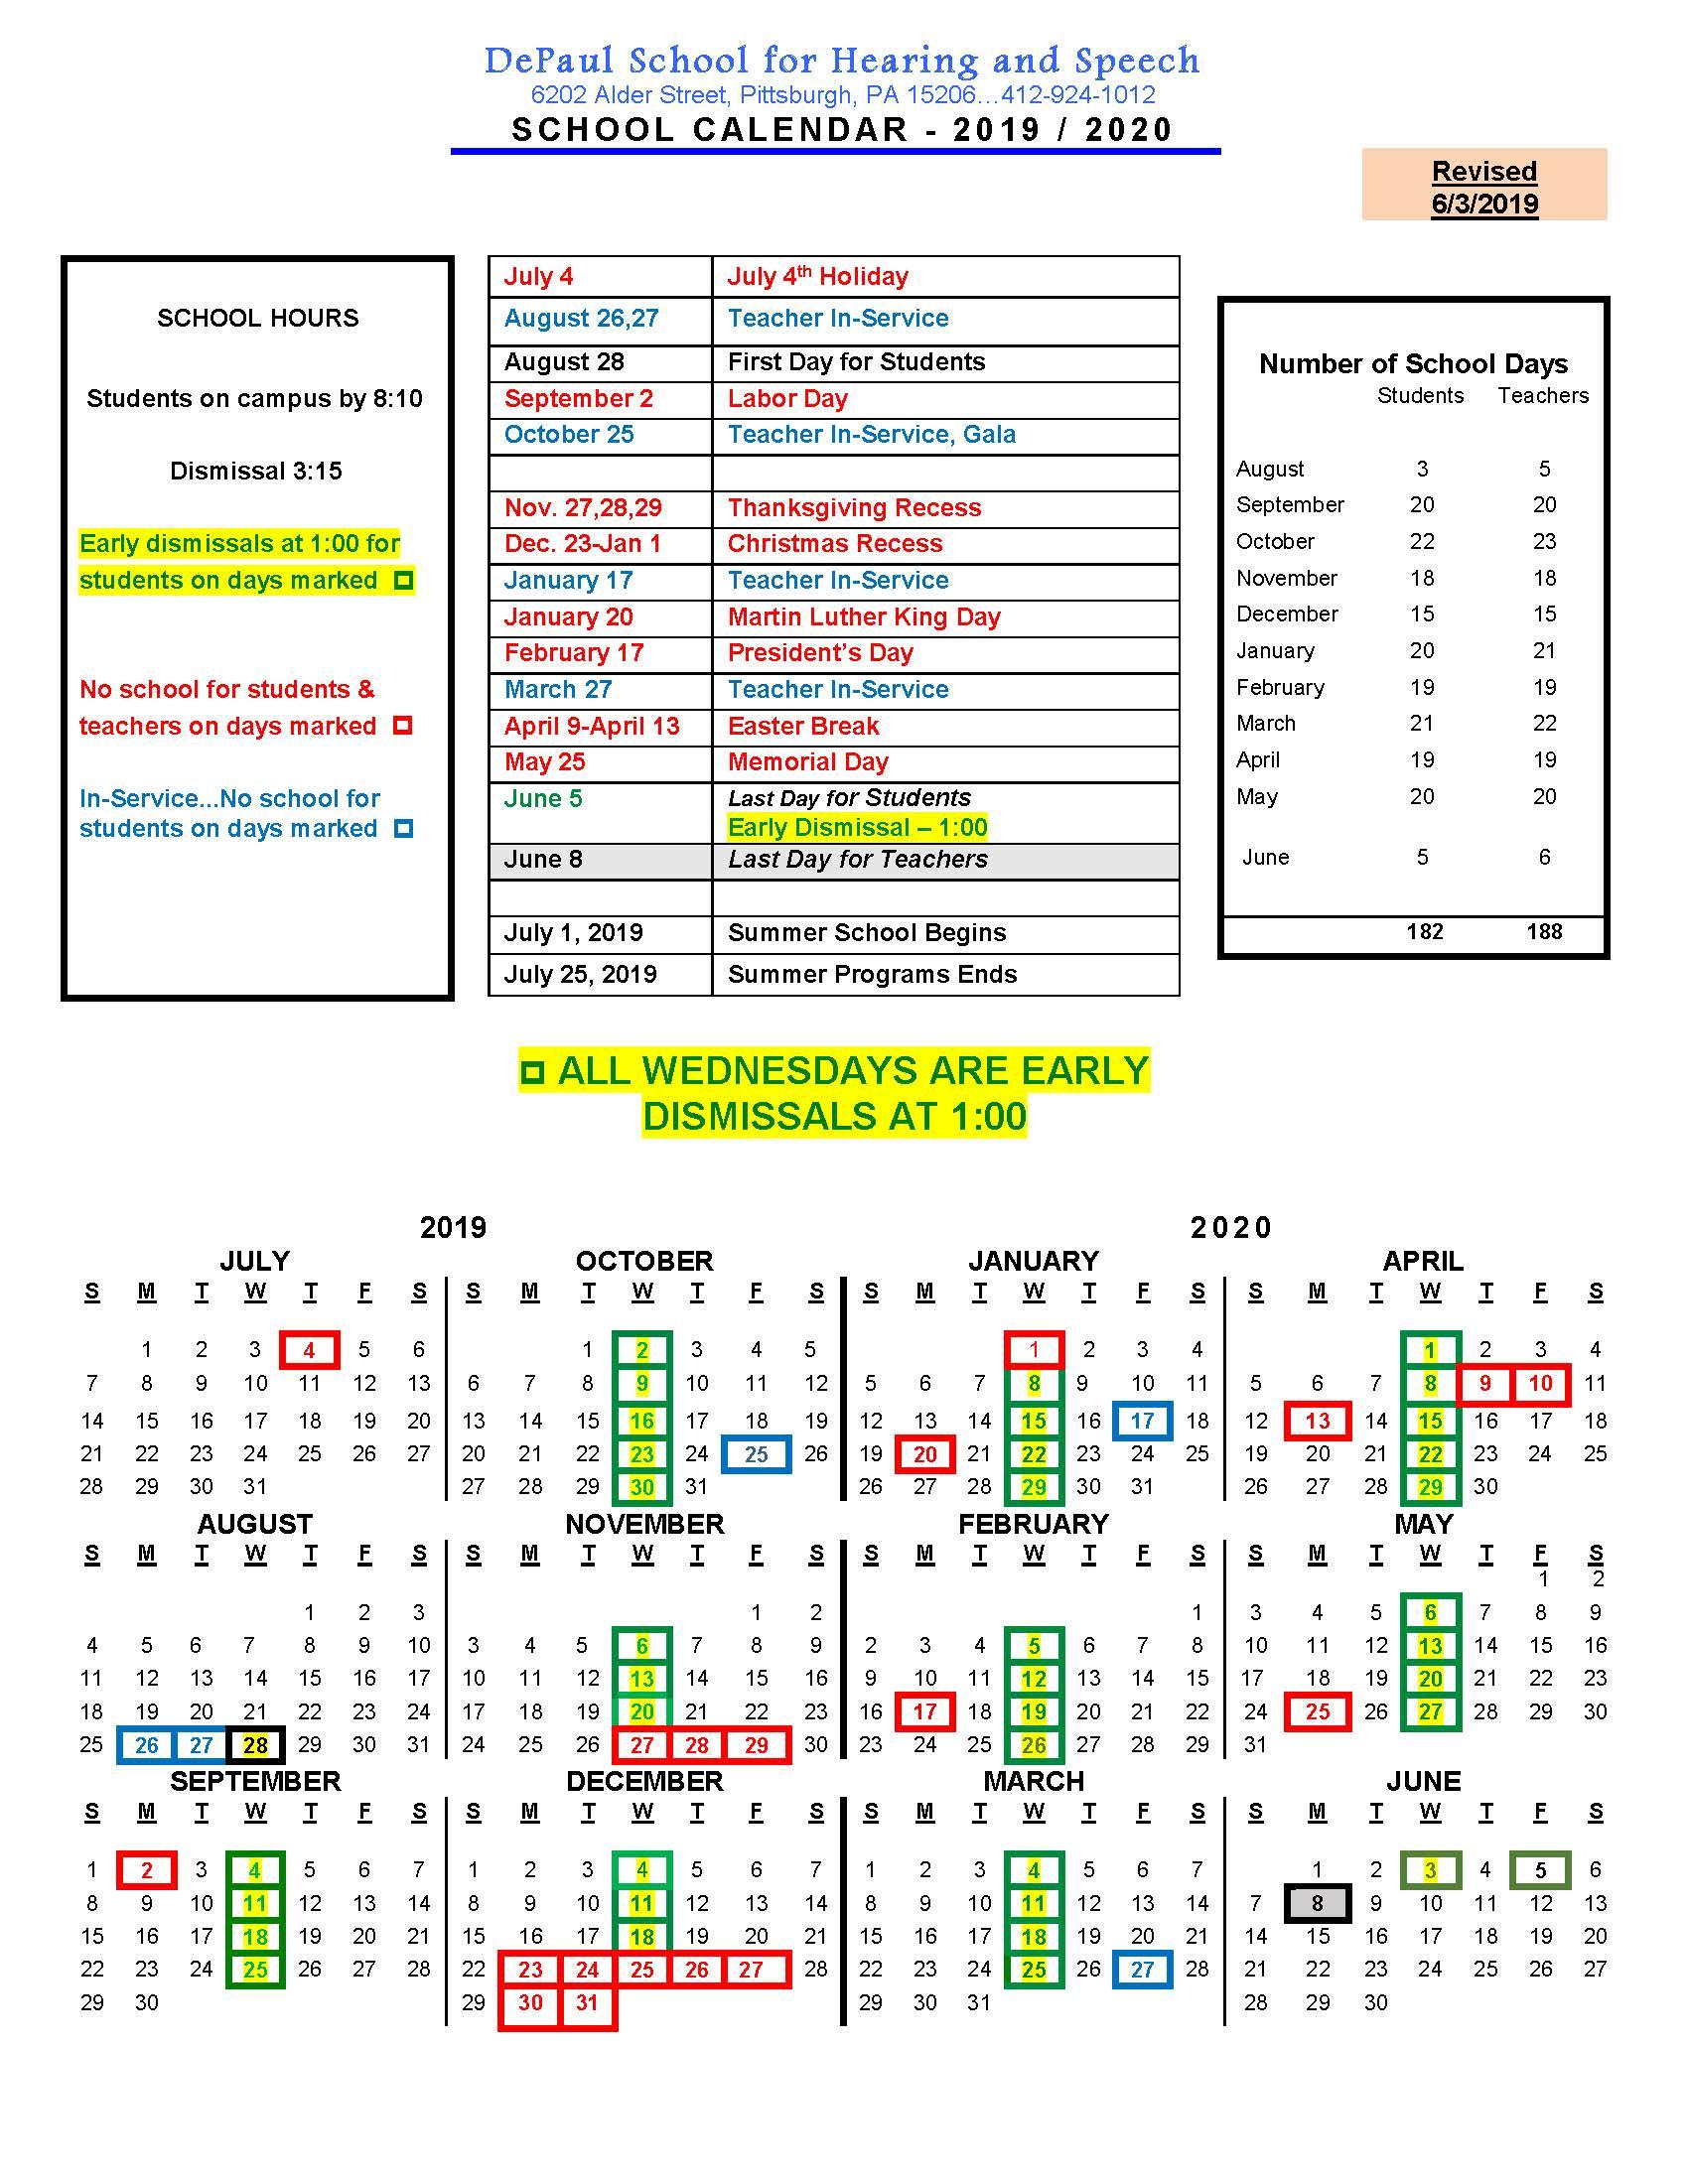 Depaul 2021 Calendar School calendar 2020 2021   DePaul School for Hearing and Speech